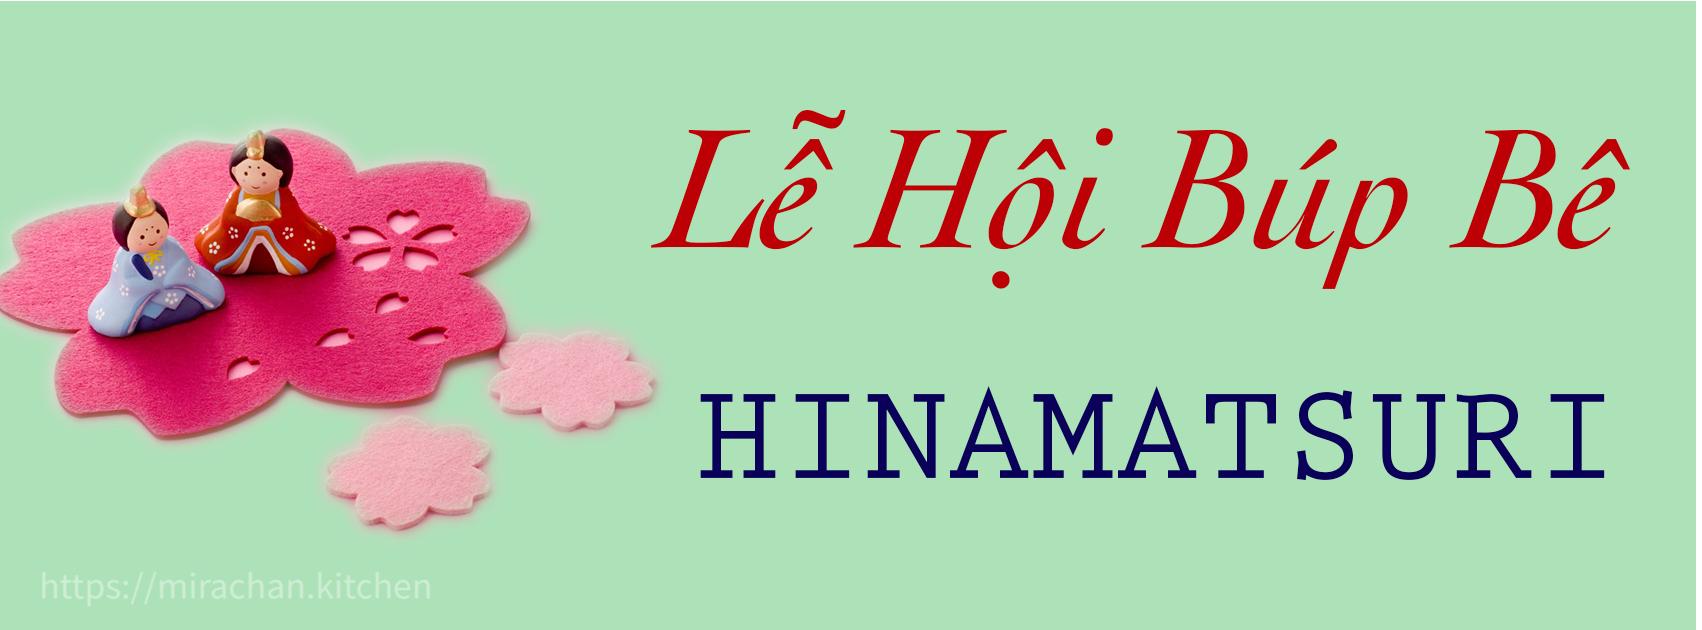 Lễ hội búp bê Hinamatsuri